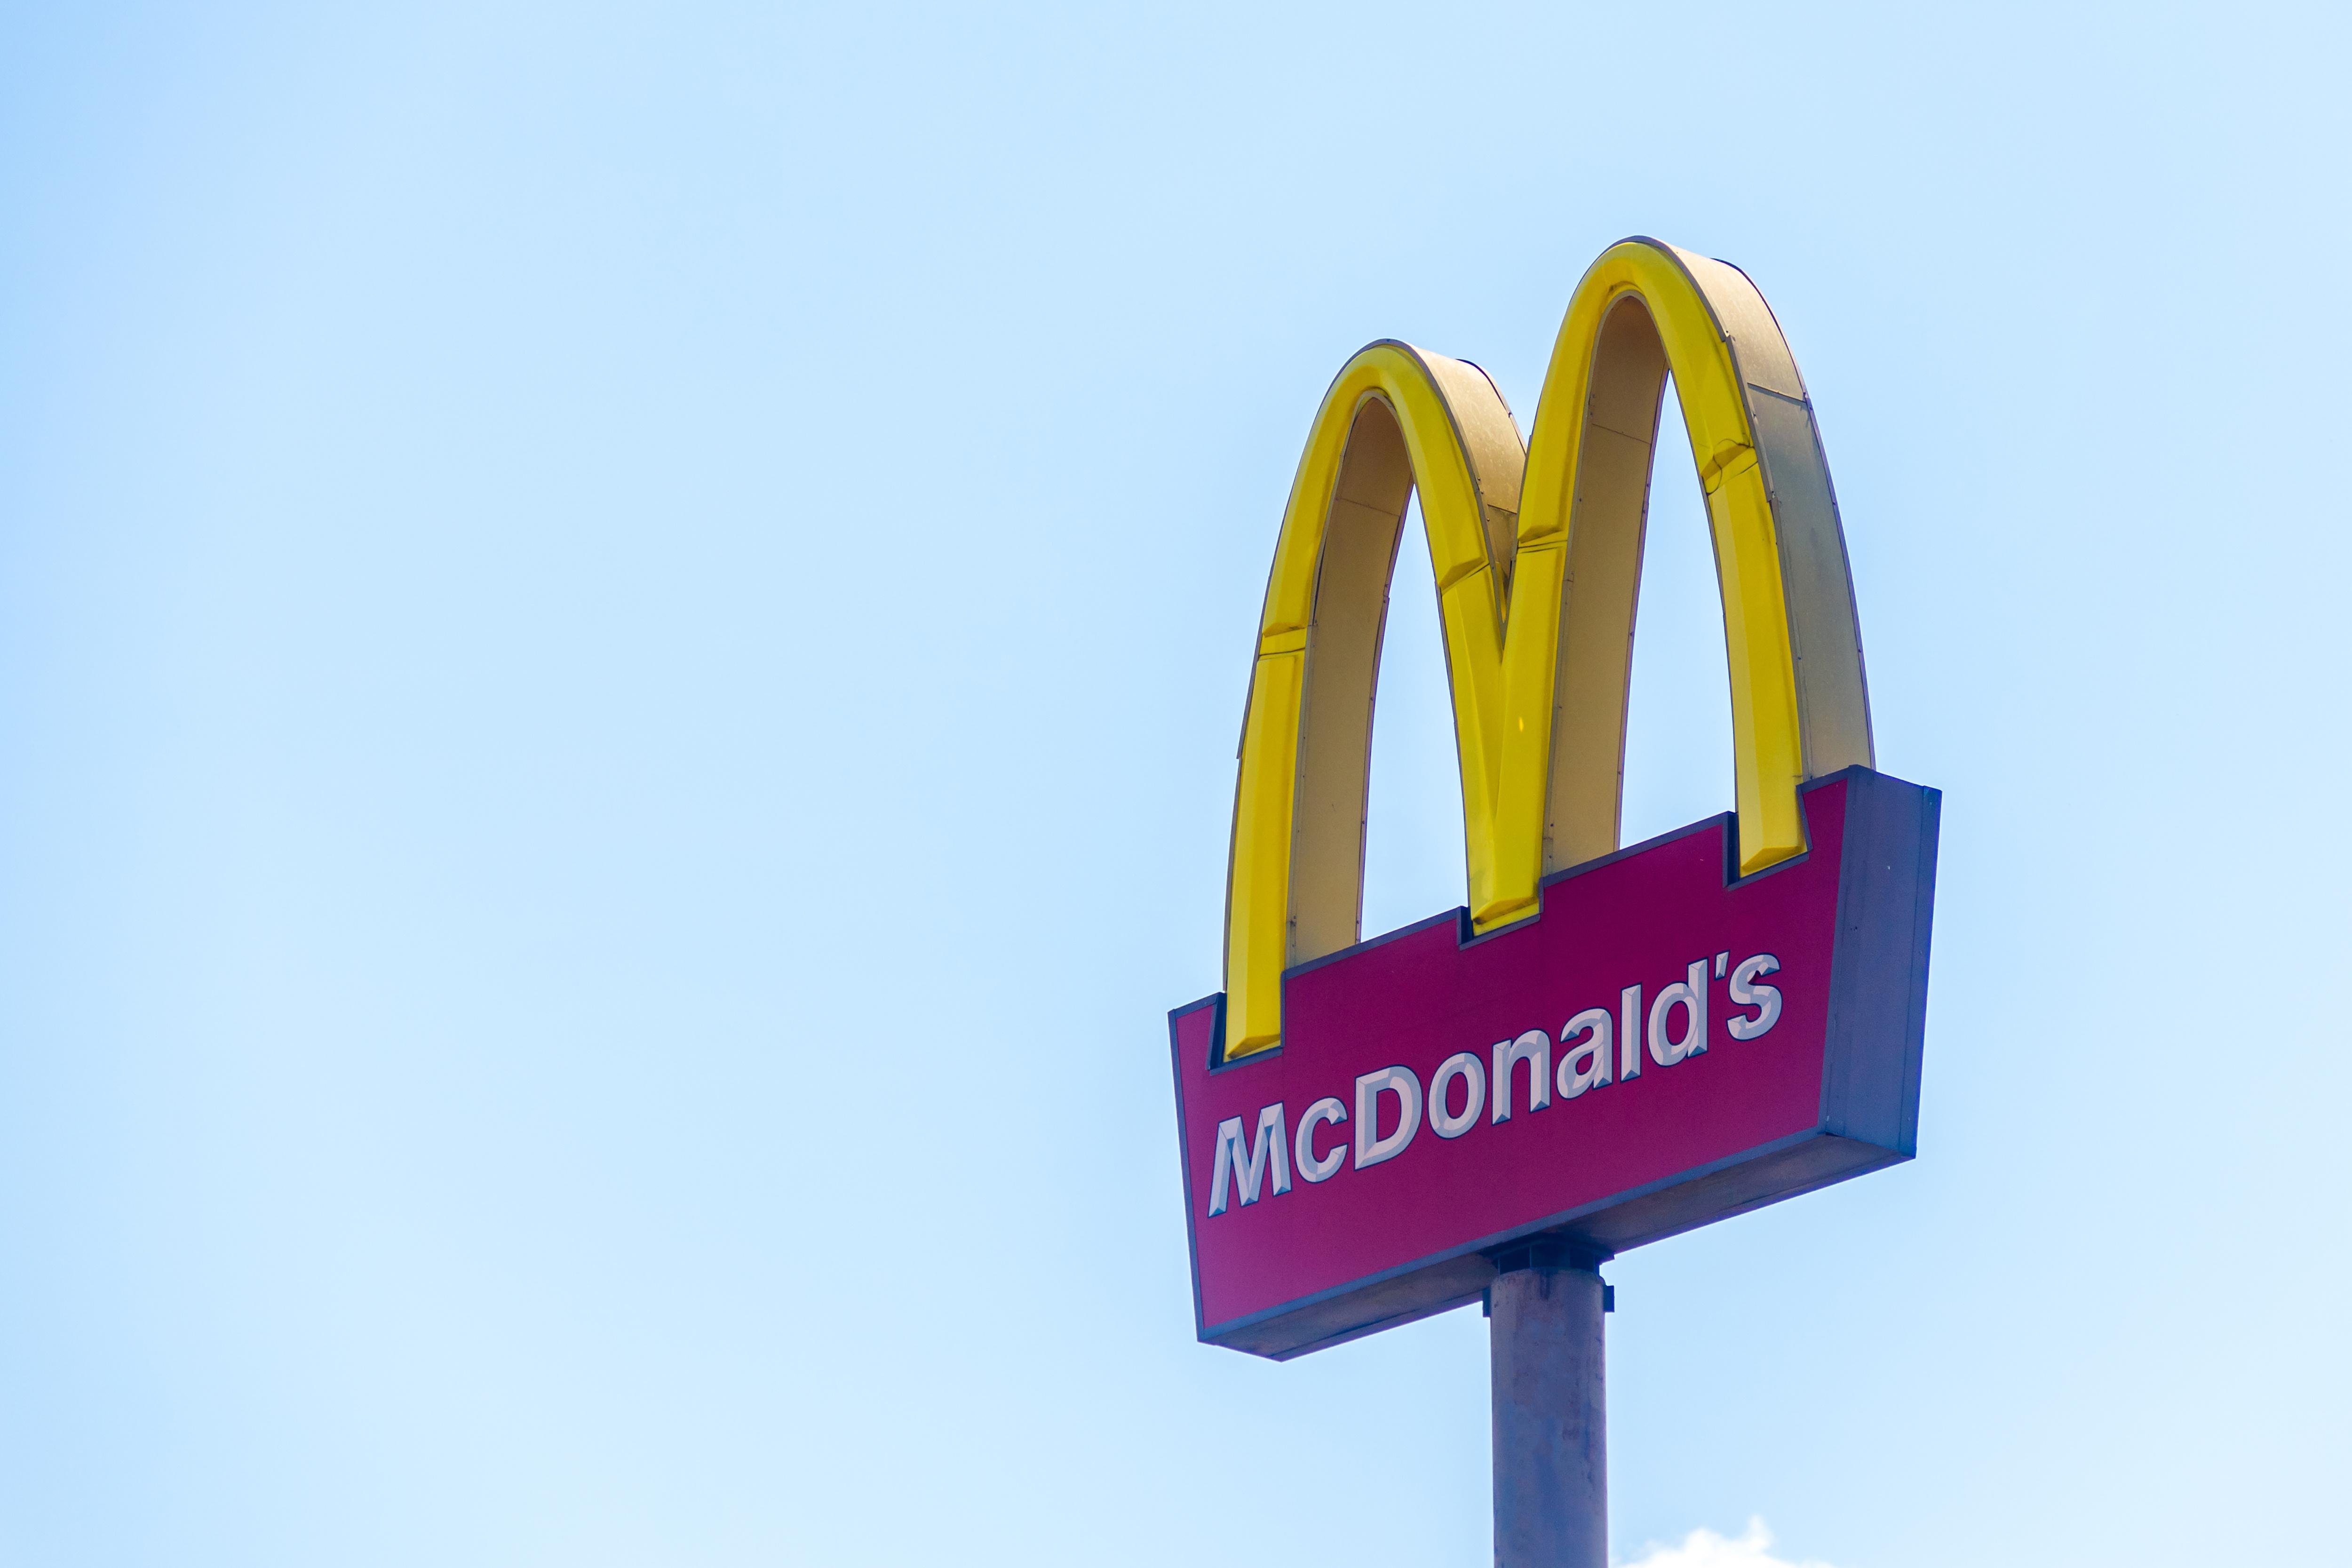 Fast food restaurant chain McDonald's logo seen in Pedro...